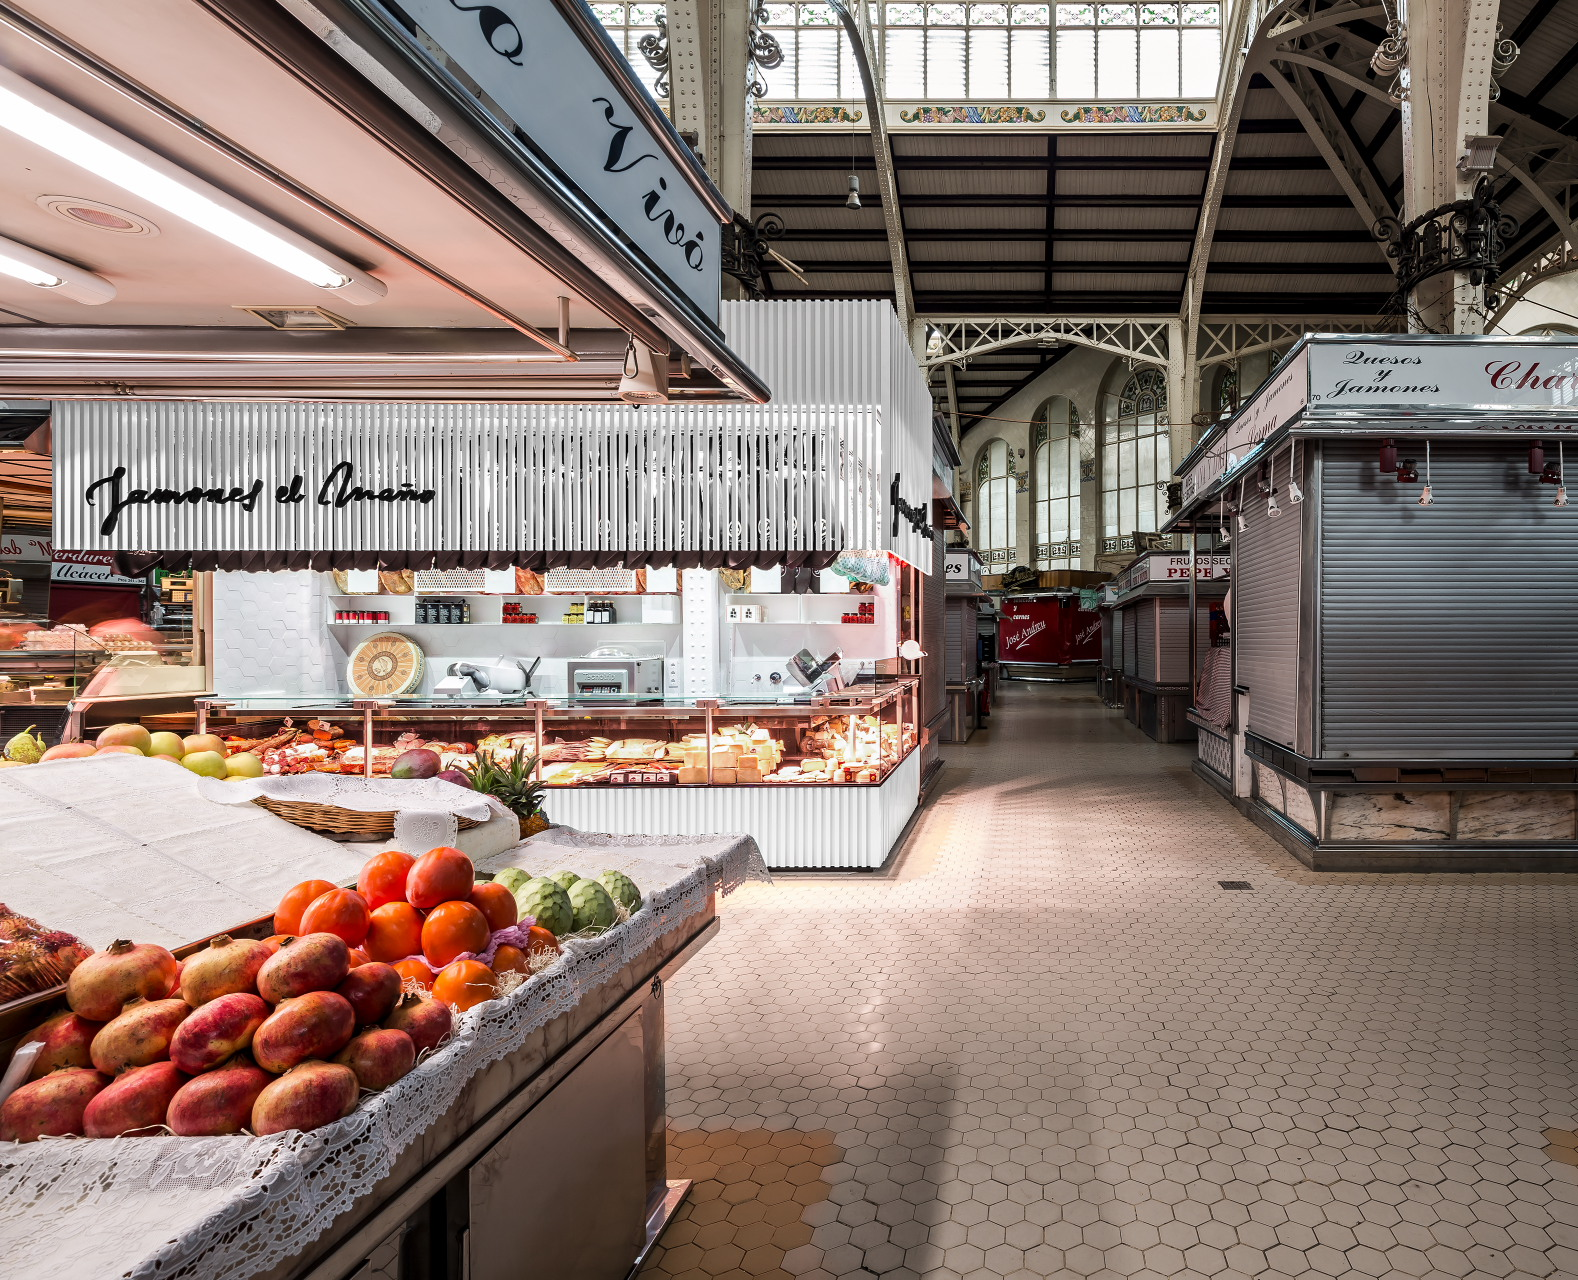 fotografia-arquitectura-valencia-german-cabo-lujan-mercado-central-jamones (5)